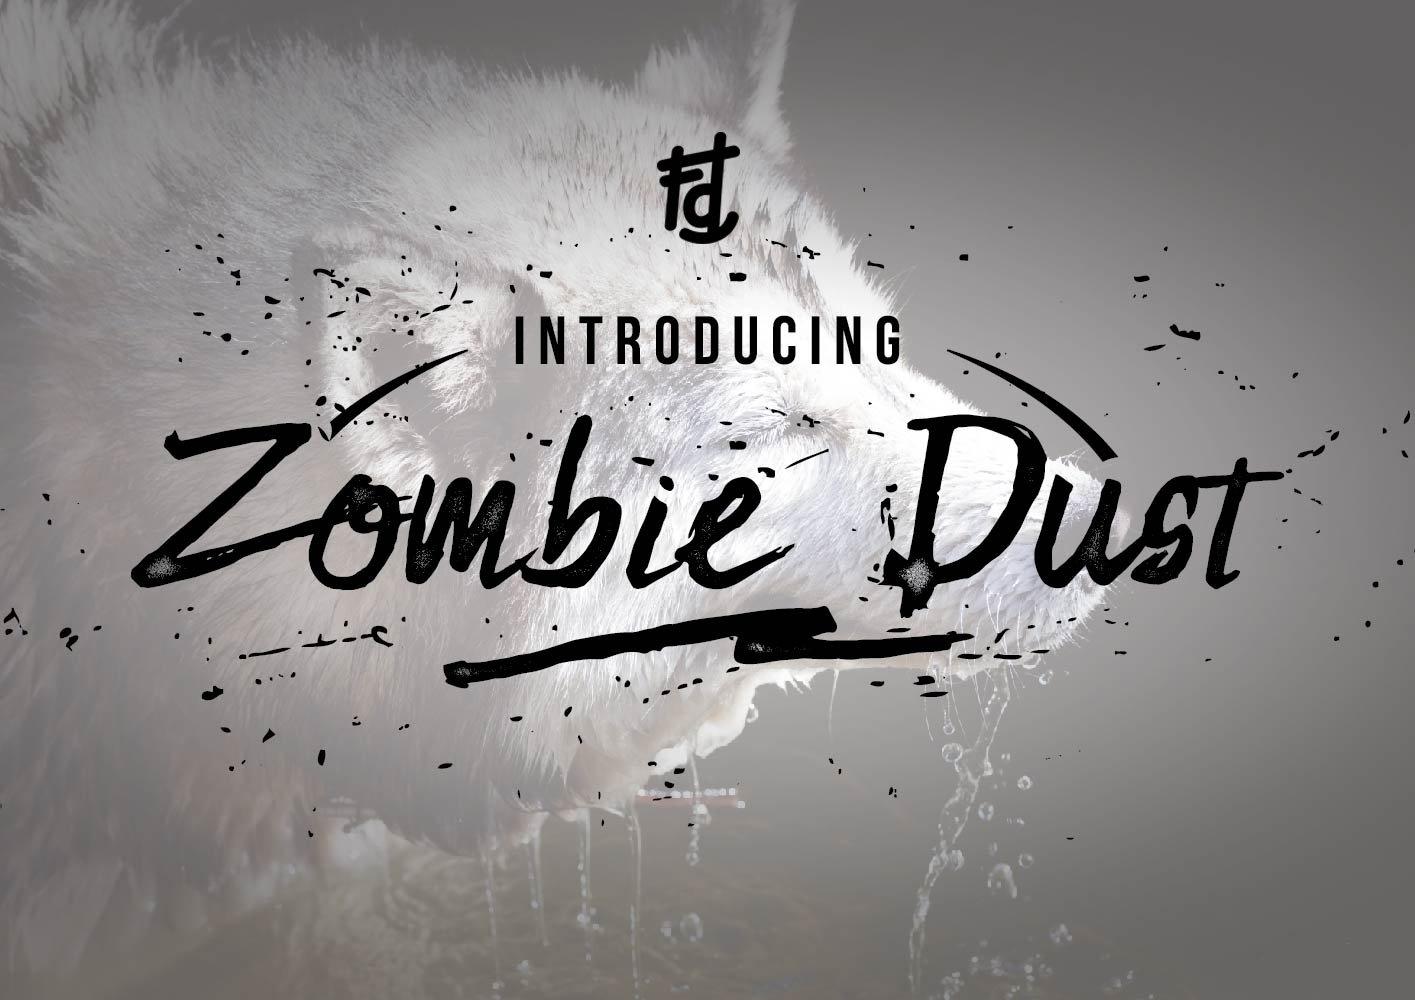 20 creepy fonts for your spooky design needs creative market blog zombie dust toneelgroepblik Choice Image